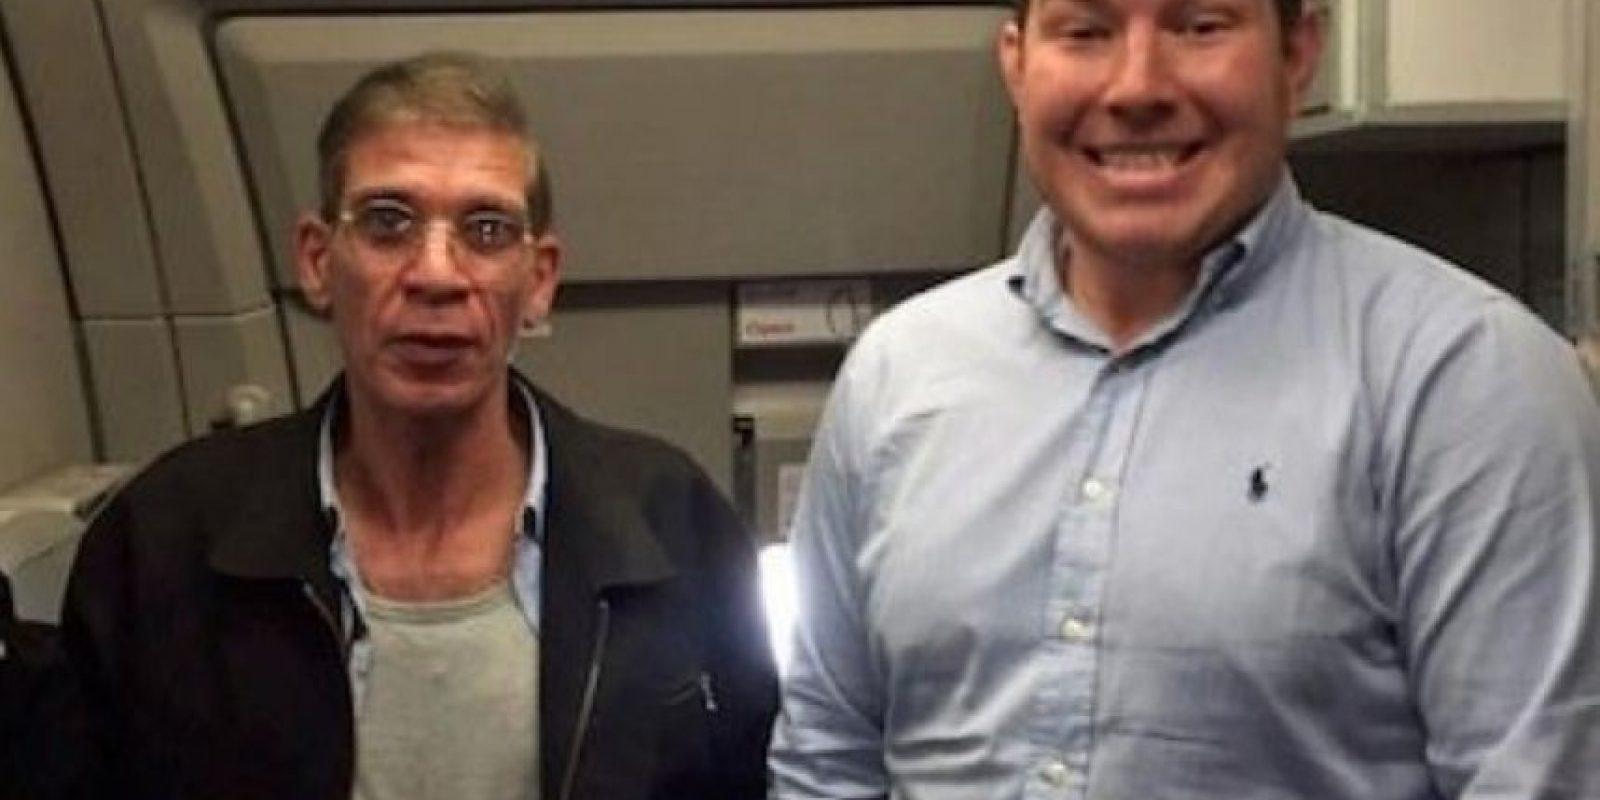 Benn Innes, se hizo viral después de tomarse un selfie con Seif Eldin Mustafa, quien secuestró un vuelo de EgyptAir para ver a su exesposa. Foto:Vía Twitter